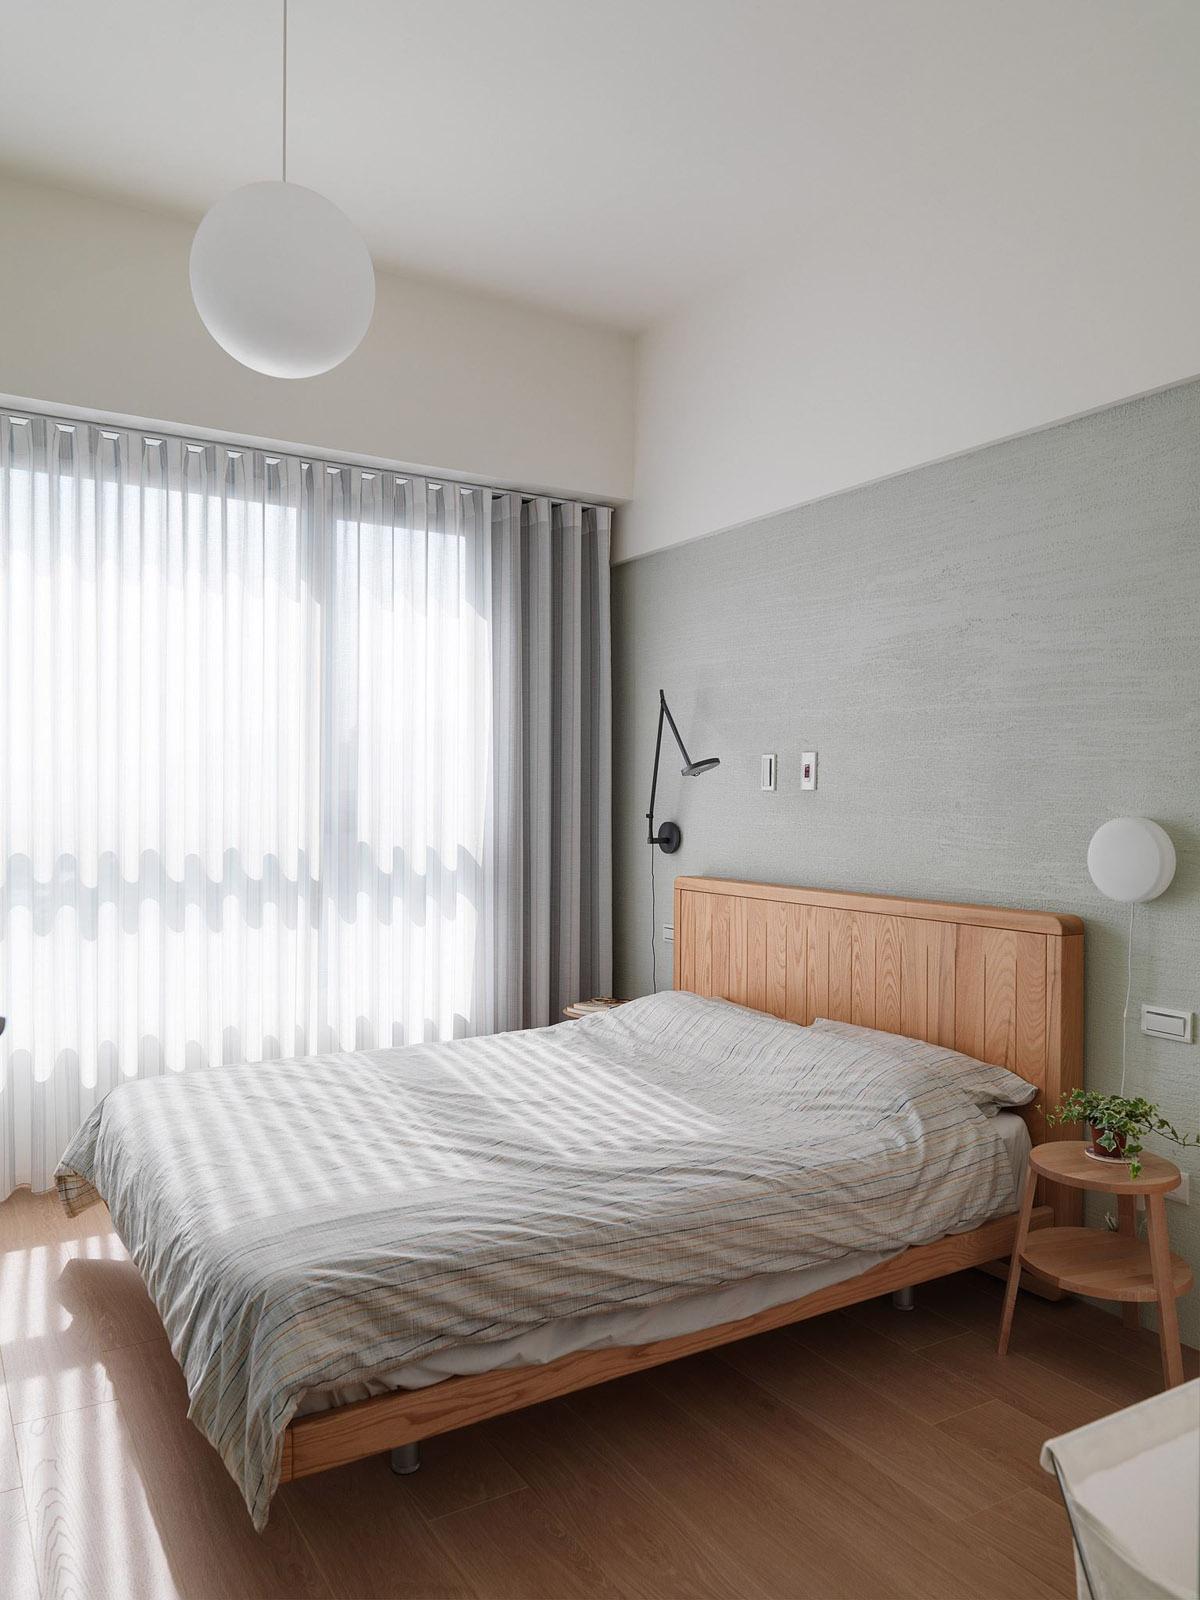 2-Bedroom Modern Apartment Design Under 100 Square Meters